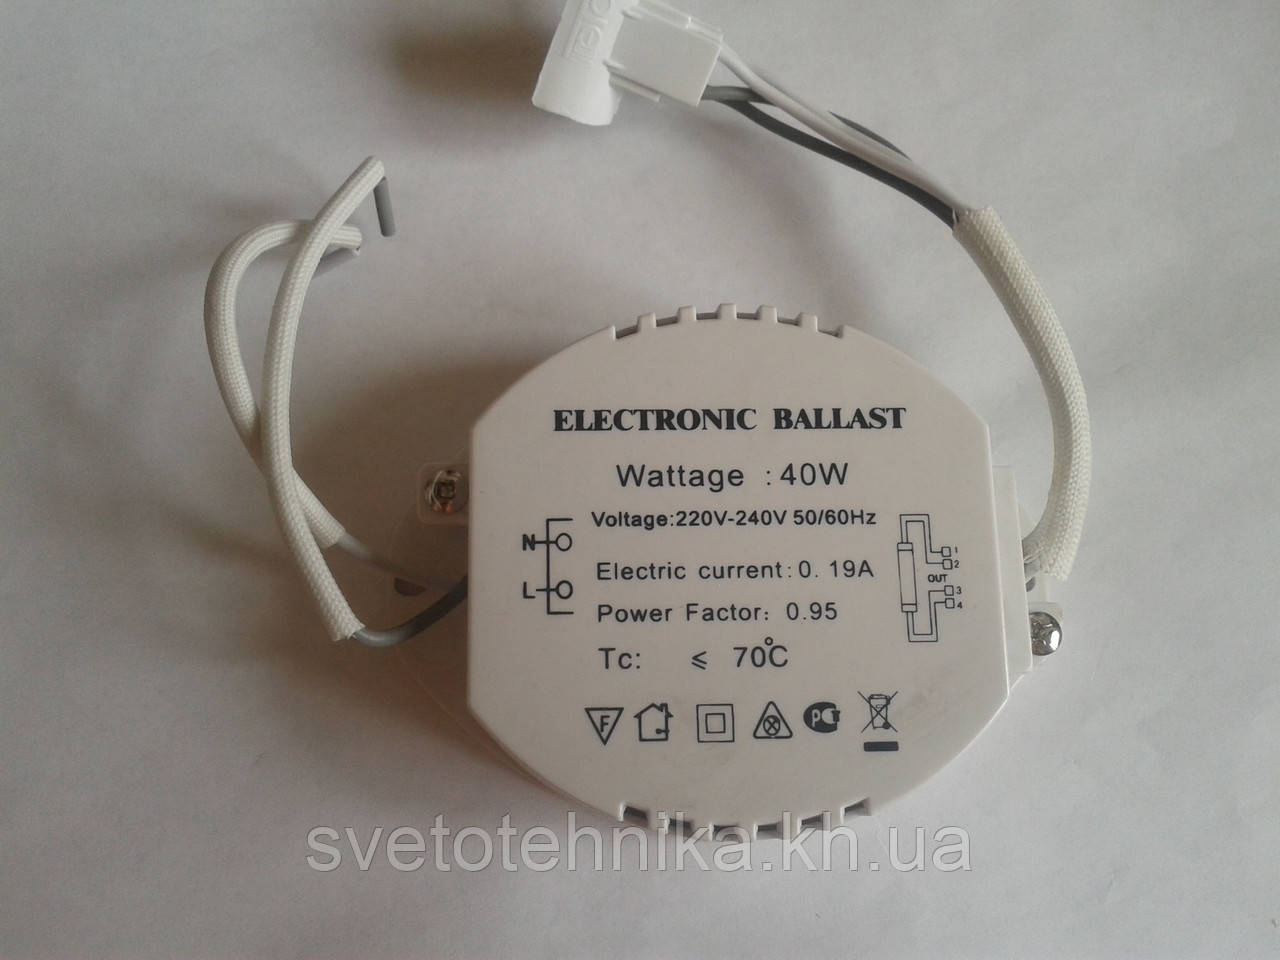 Электронный балласт 40 Вт для кольцевых люминесцентных ламп